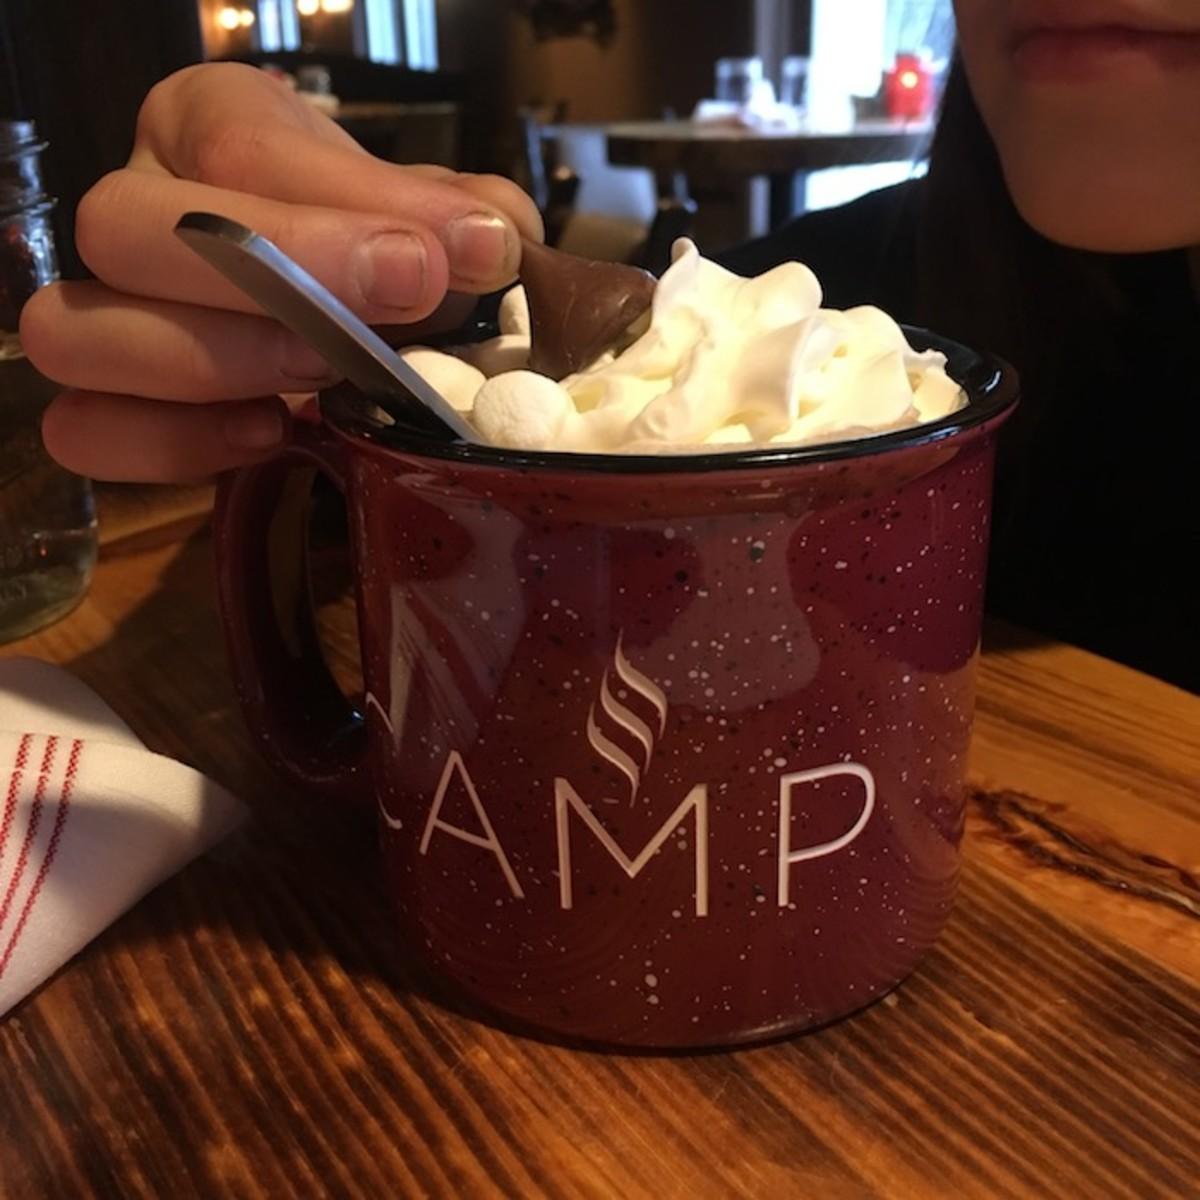 Camp cocoa